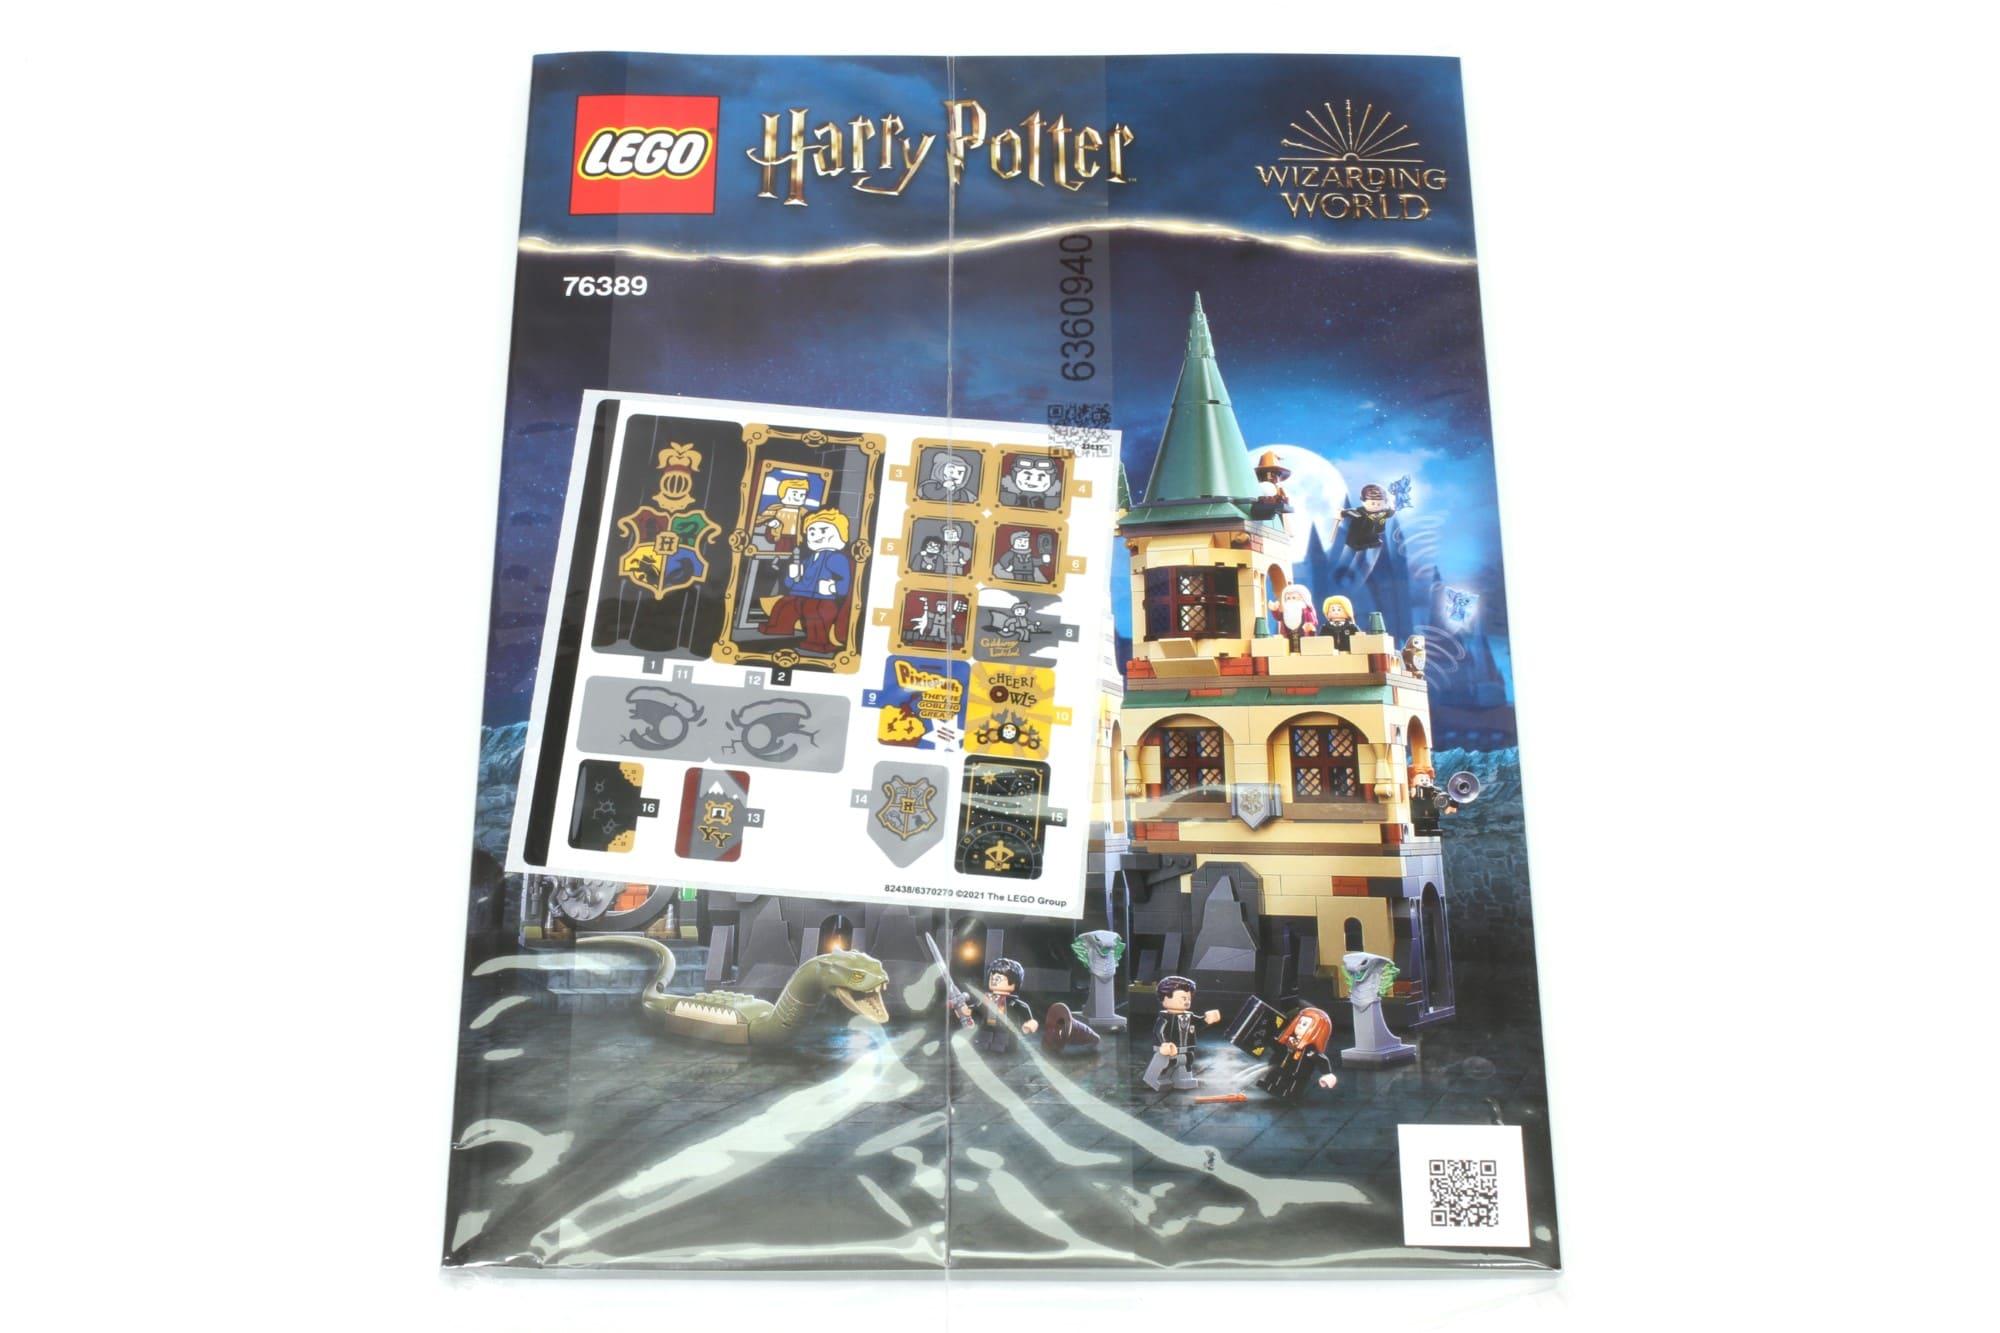 LEGO Harry Potter 76389 Hogwarts Kammer Des Schreckens Anleitung